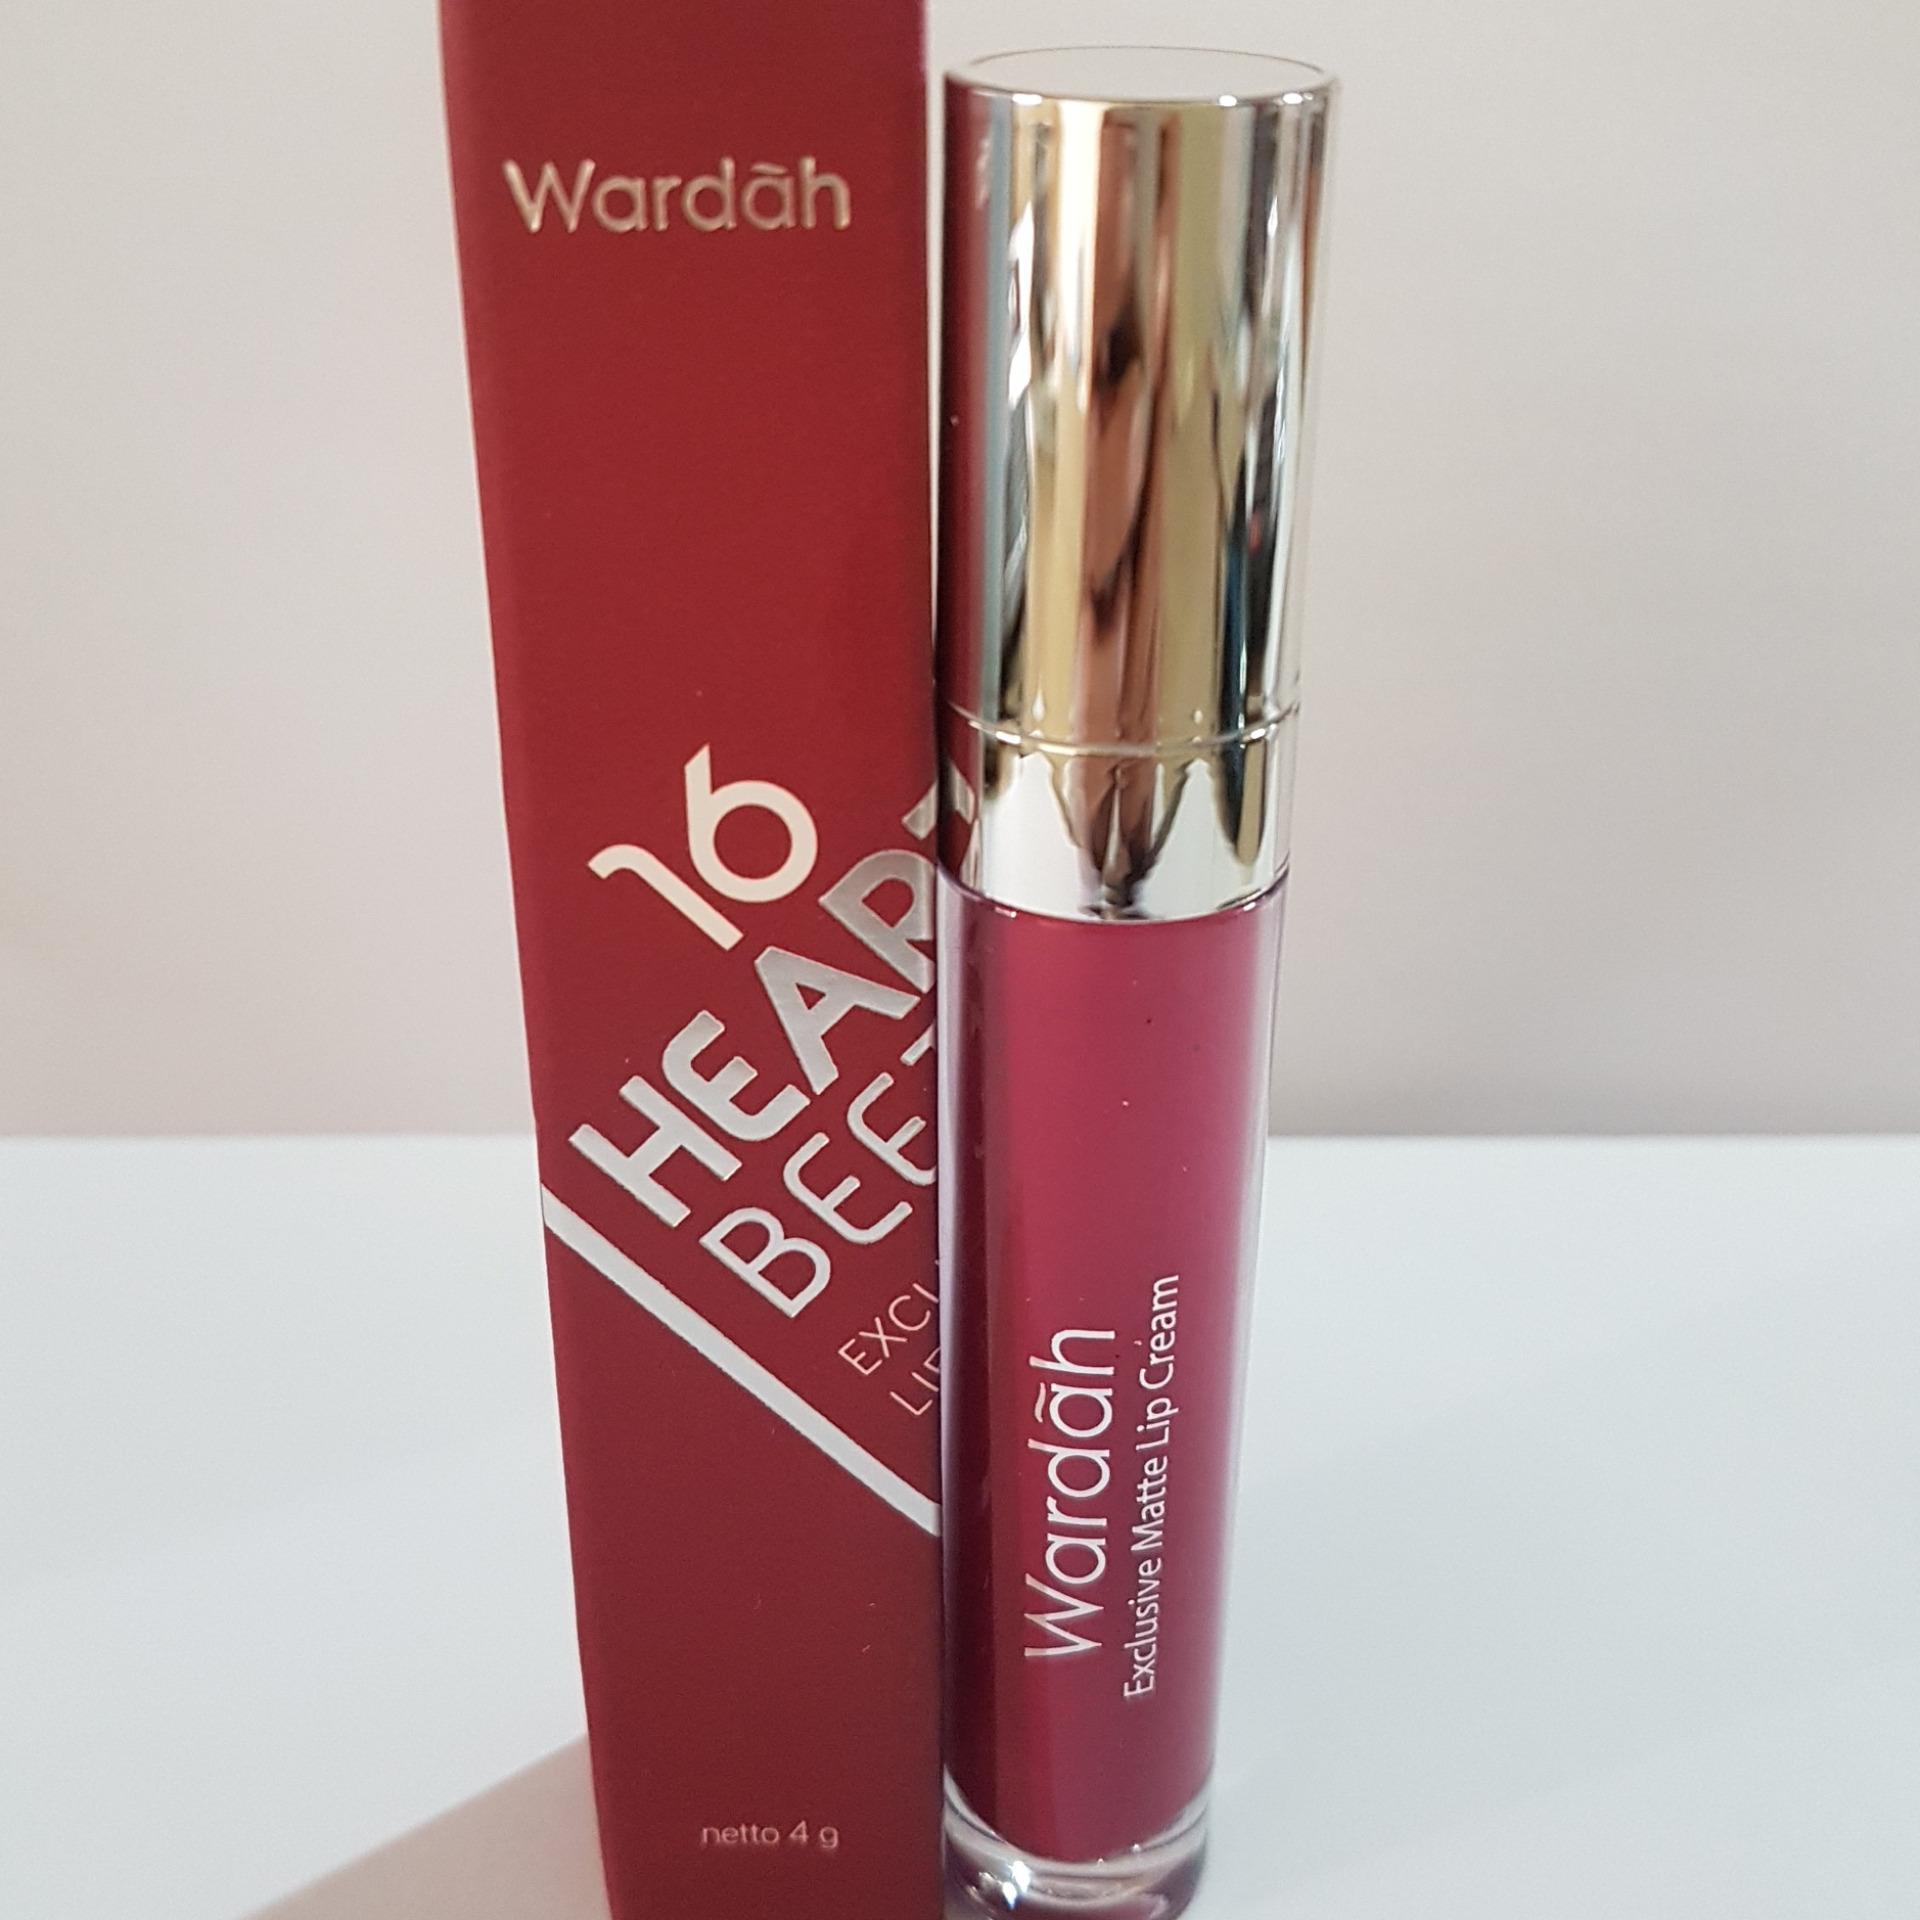 Daftar Harga Wardah Exclusive Matte Lip Cream 16 Heartbeet Belanja Flash Sale